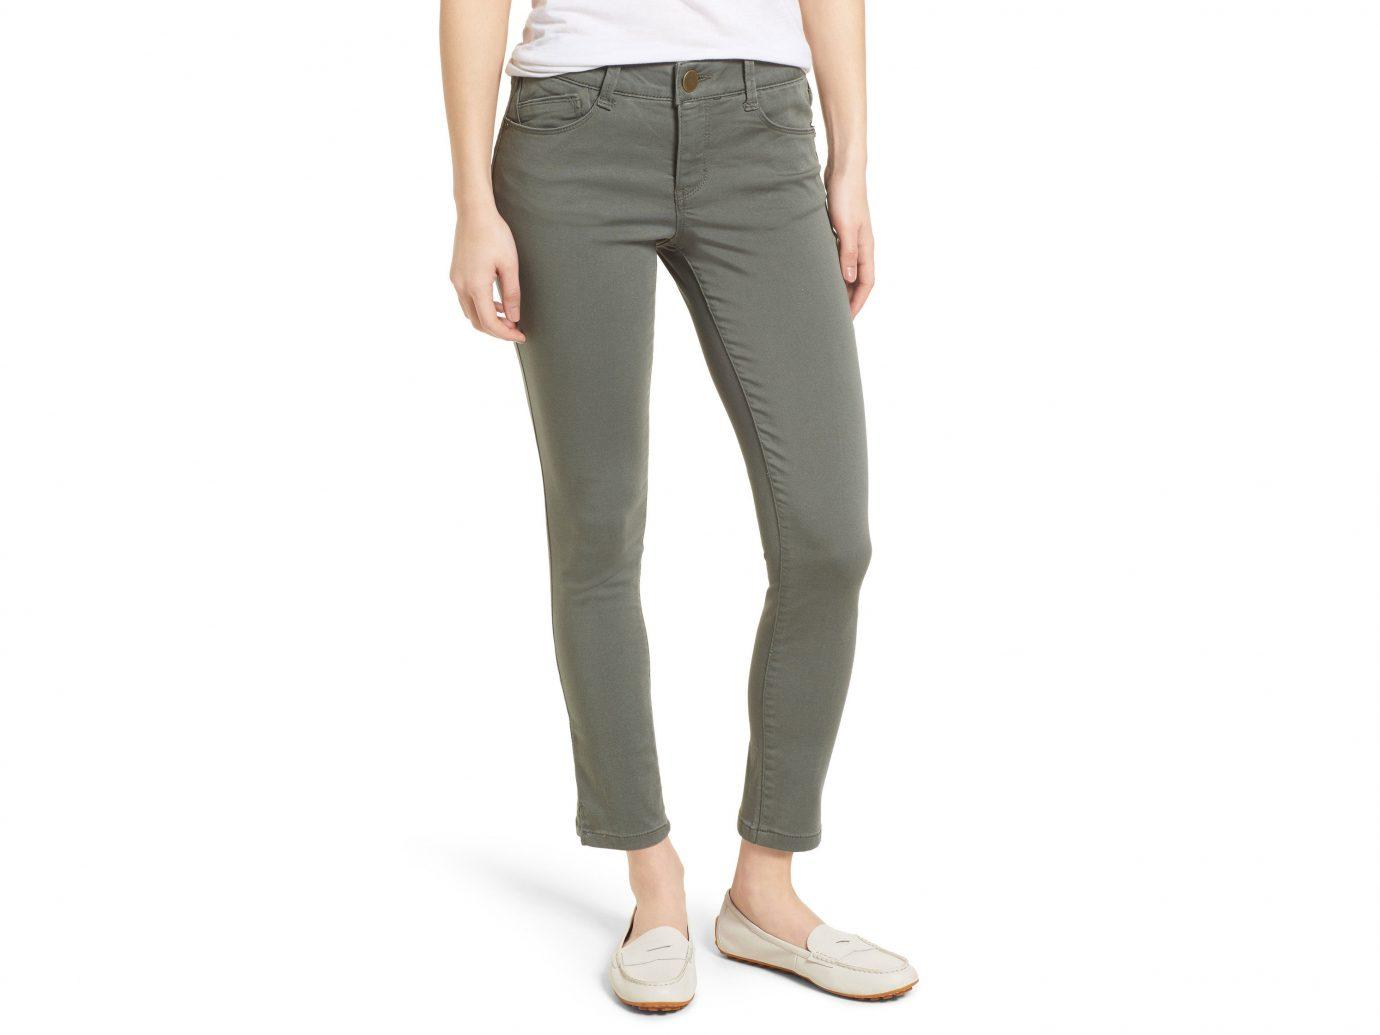 Style + Design Travel Shop clothing person woman trouser khaki standing posing jeans denim trousers active pants waist pocket joint shoe female